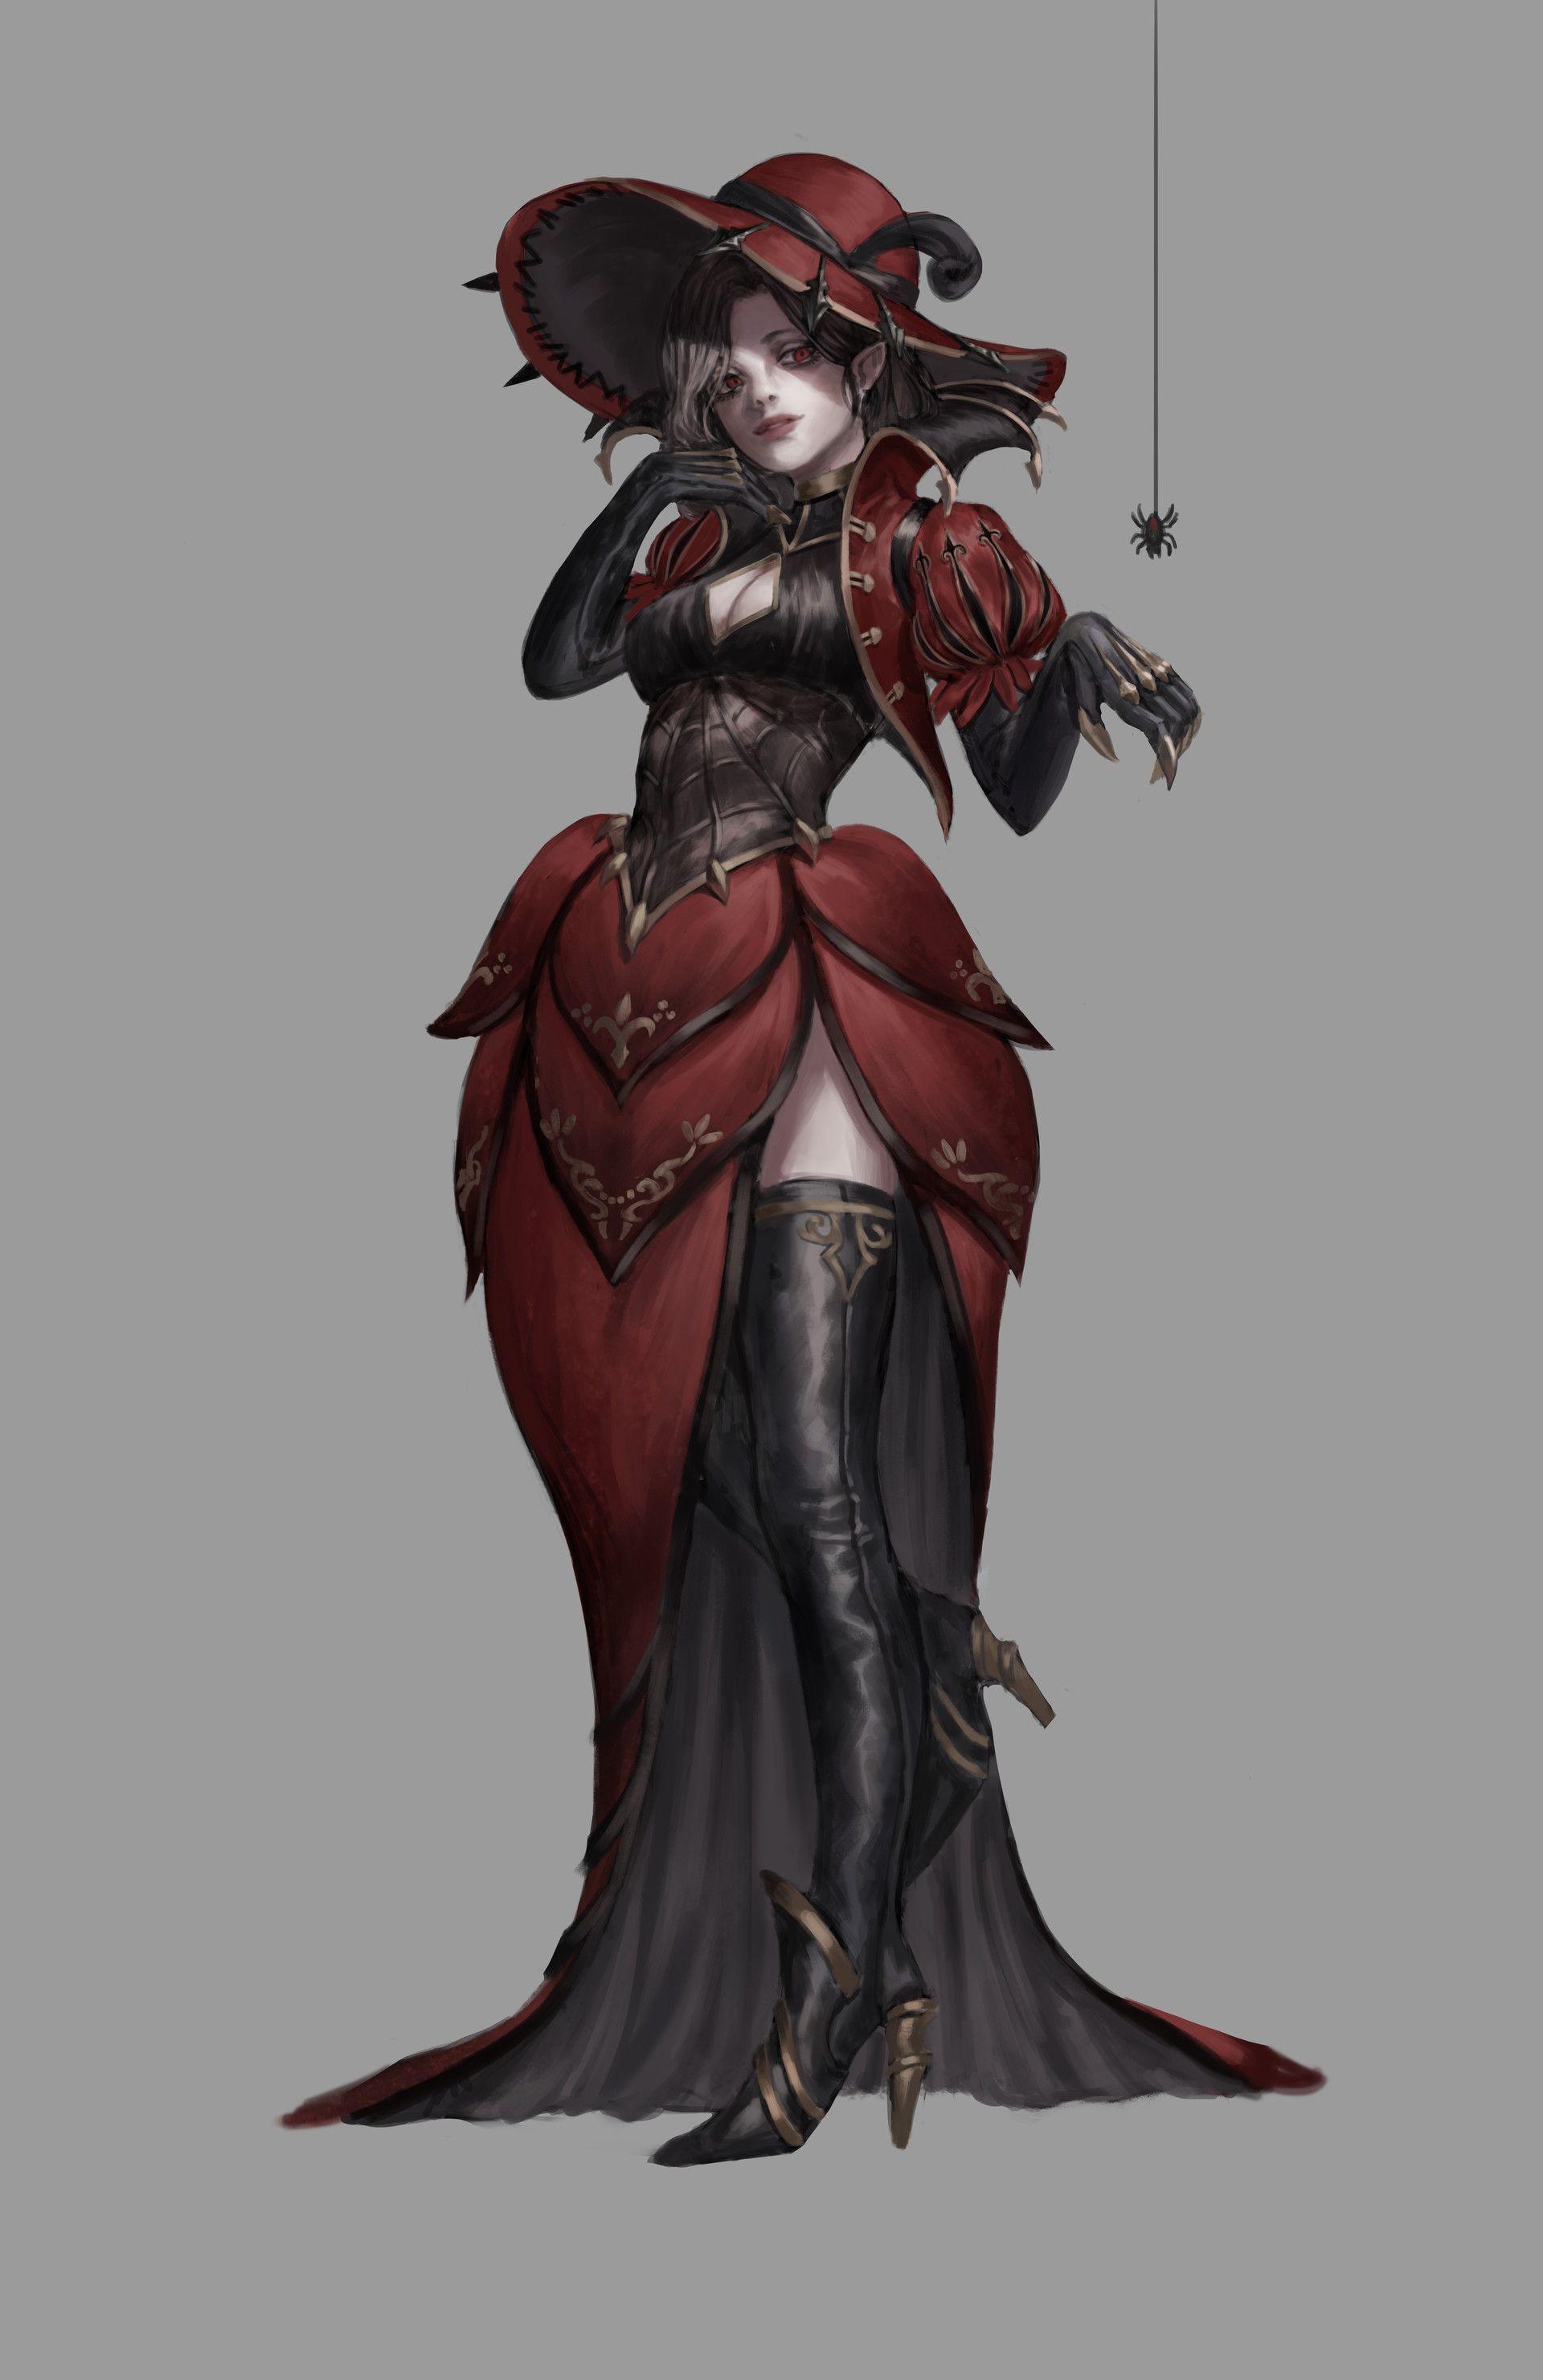 ArtStation Spider Queen, Gold can Character Portraits